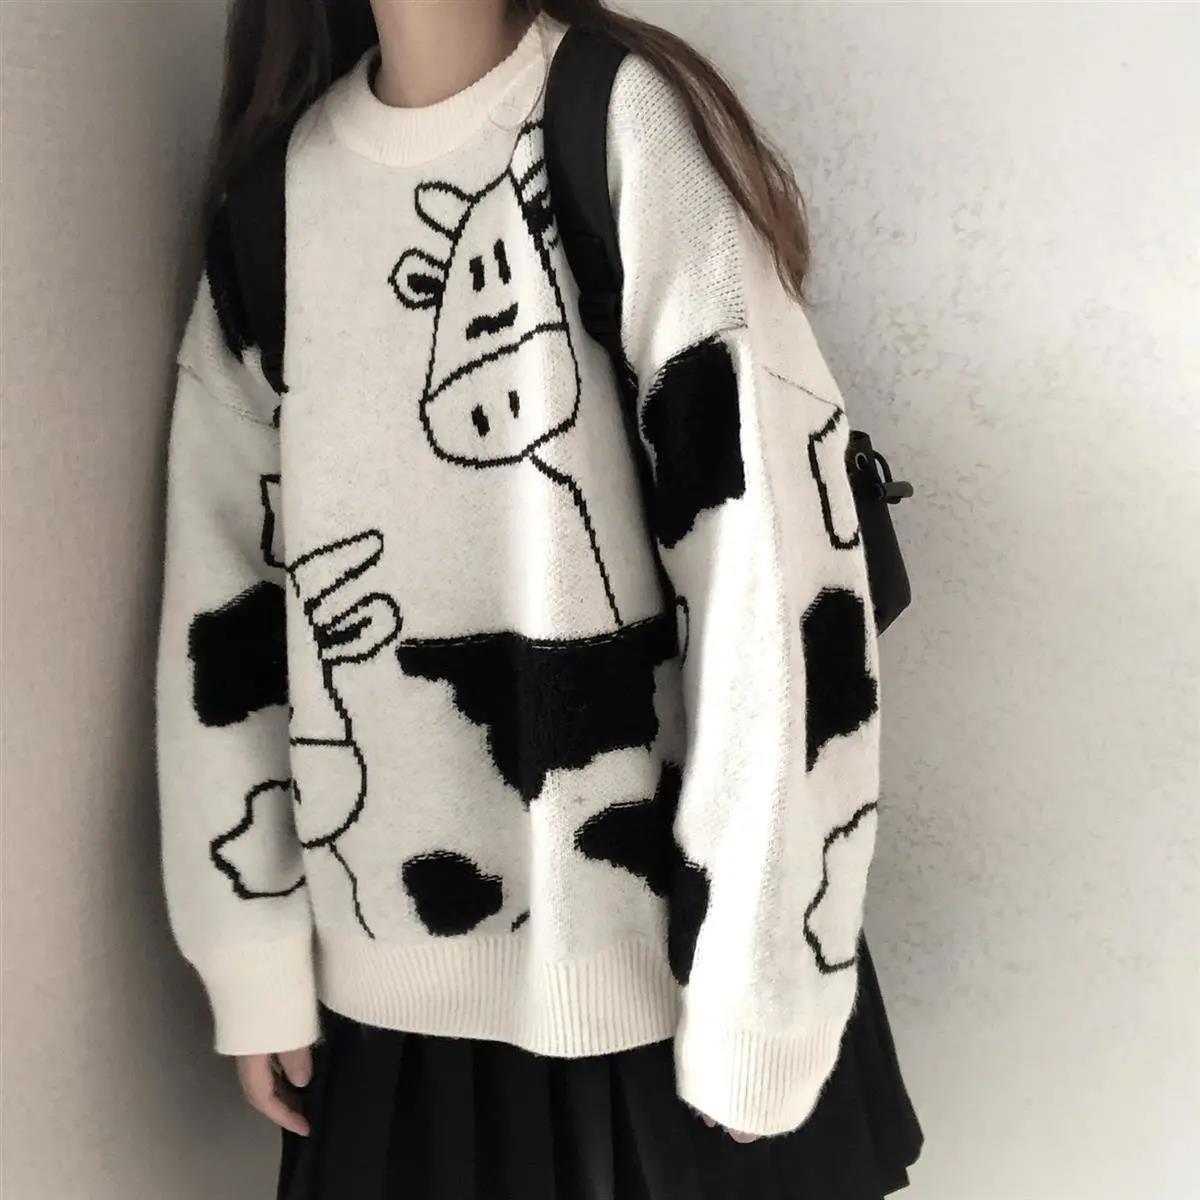 Egirl Harajuku pullover with a cow print 43